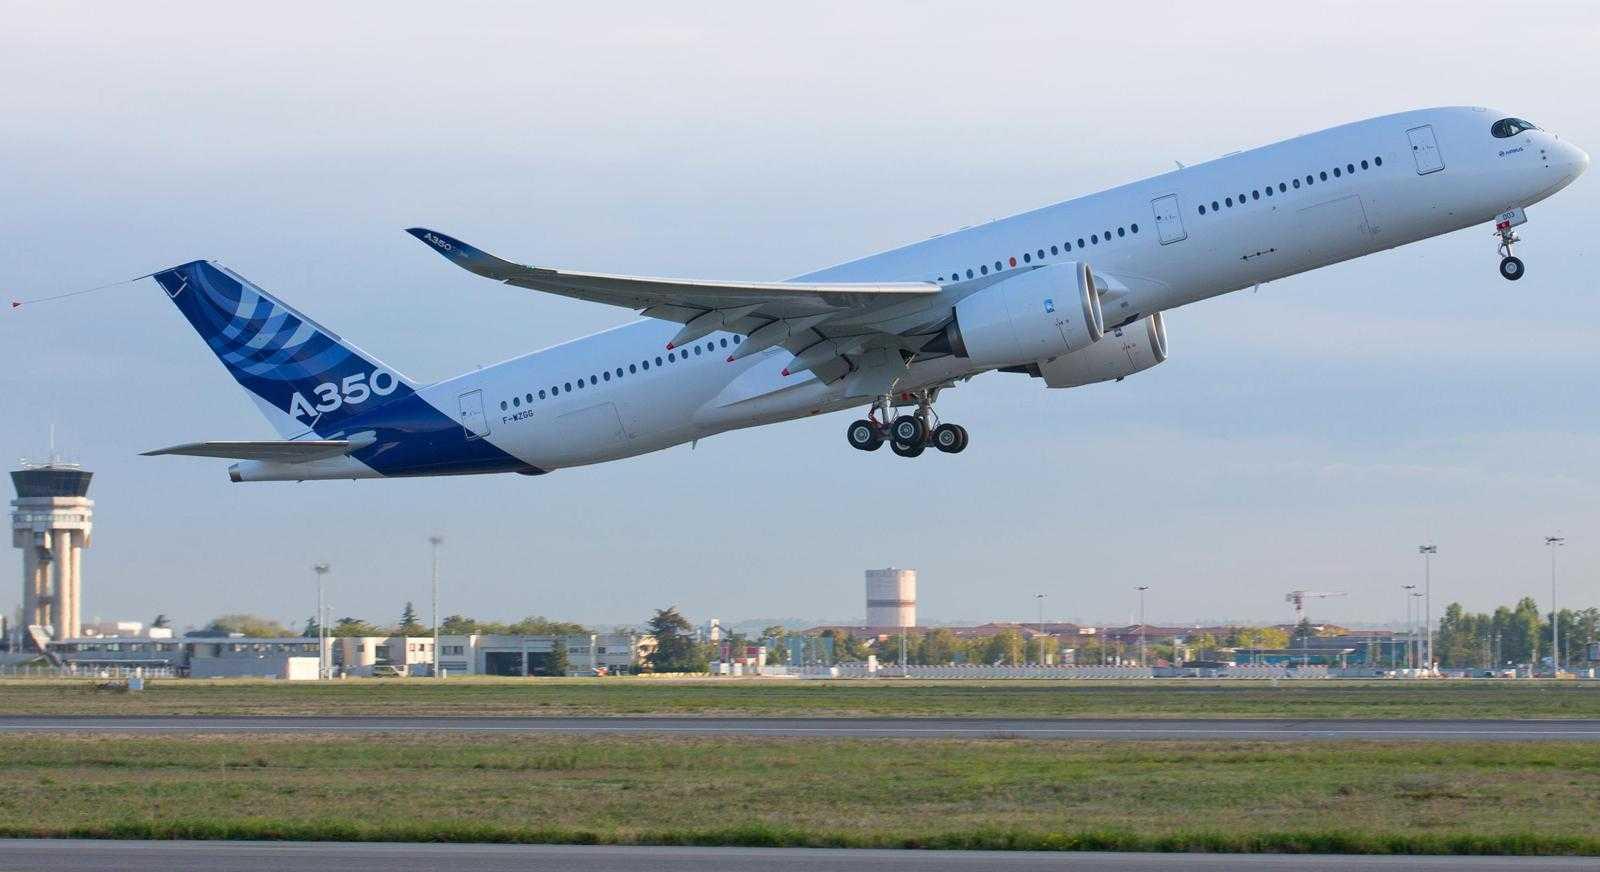 A350_XWB_MSN3_F-WZGG_First_Flight_take_off